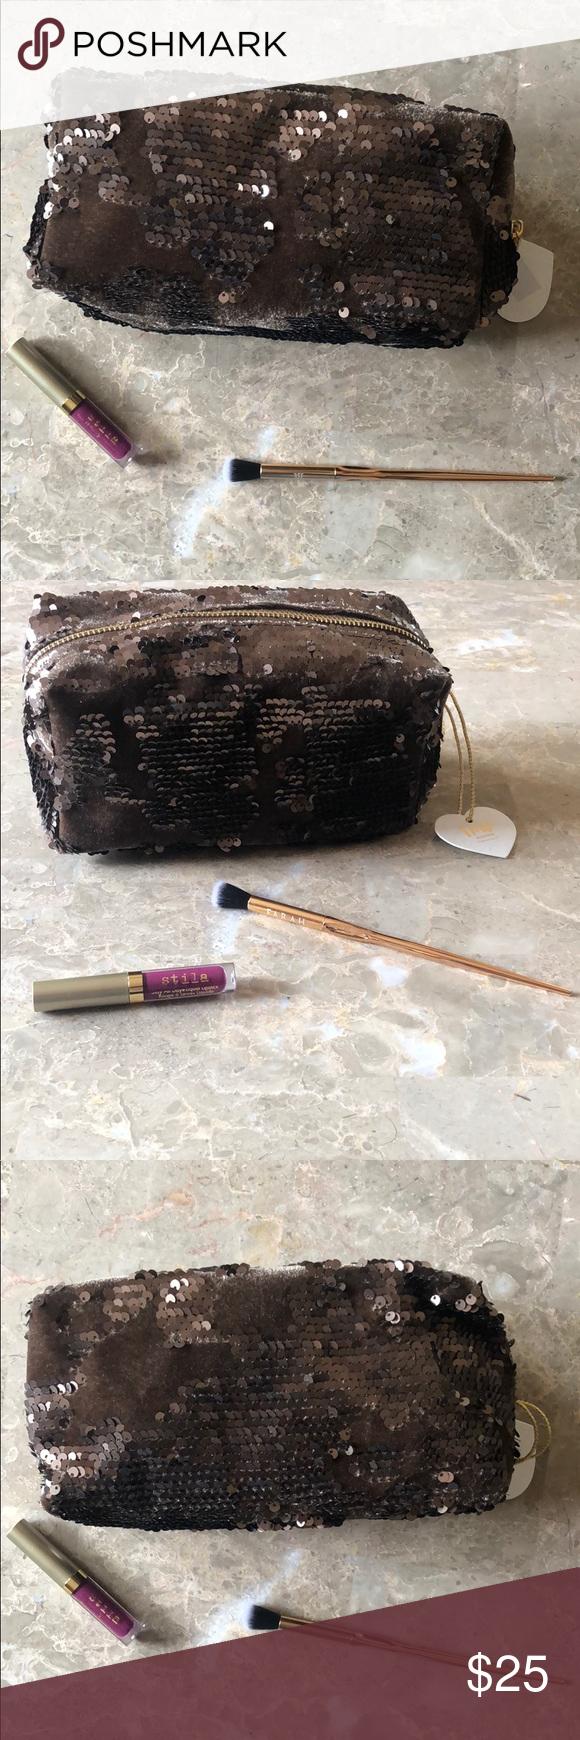 NWT Imoshion Velvet Sequin Cosmetic Bag Cosmetic bag